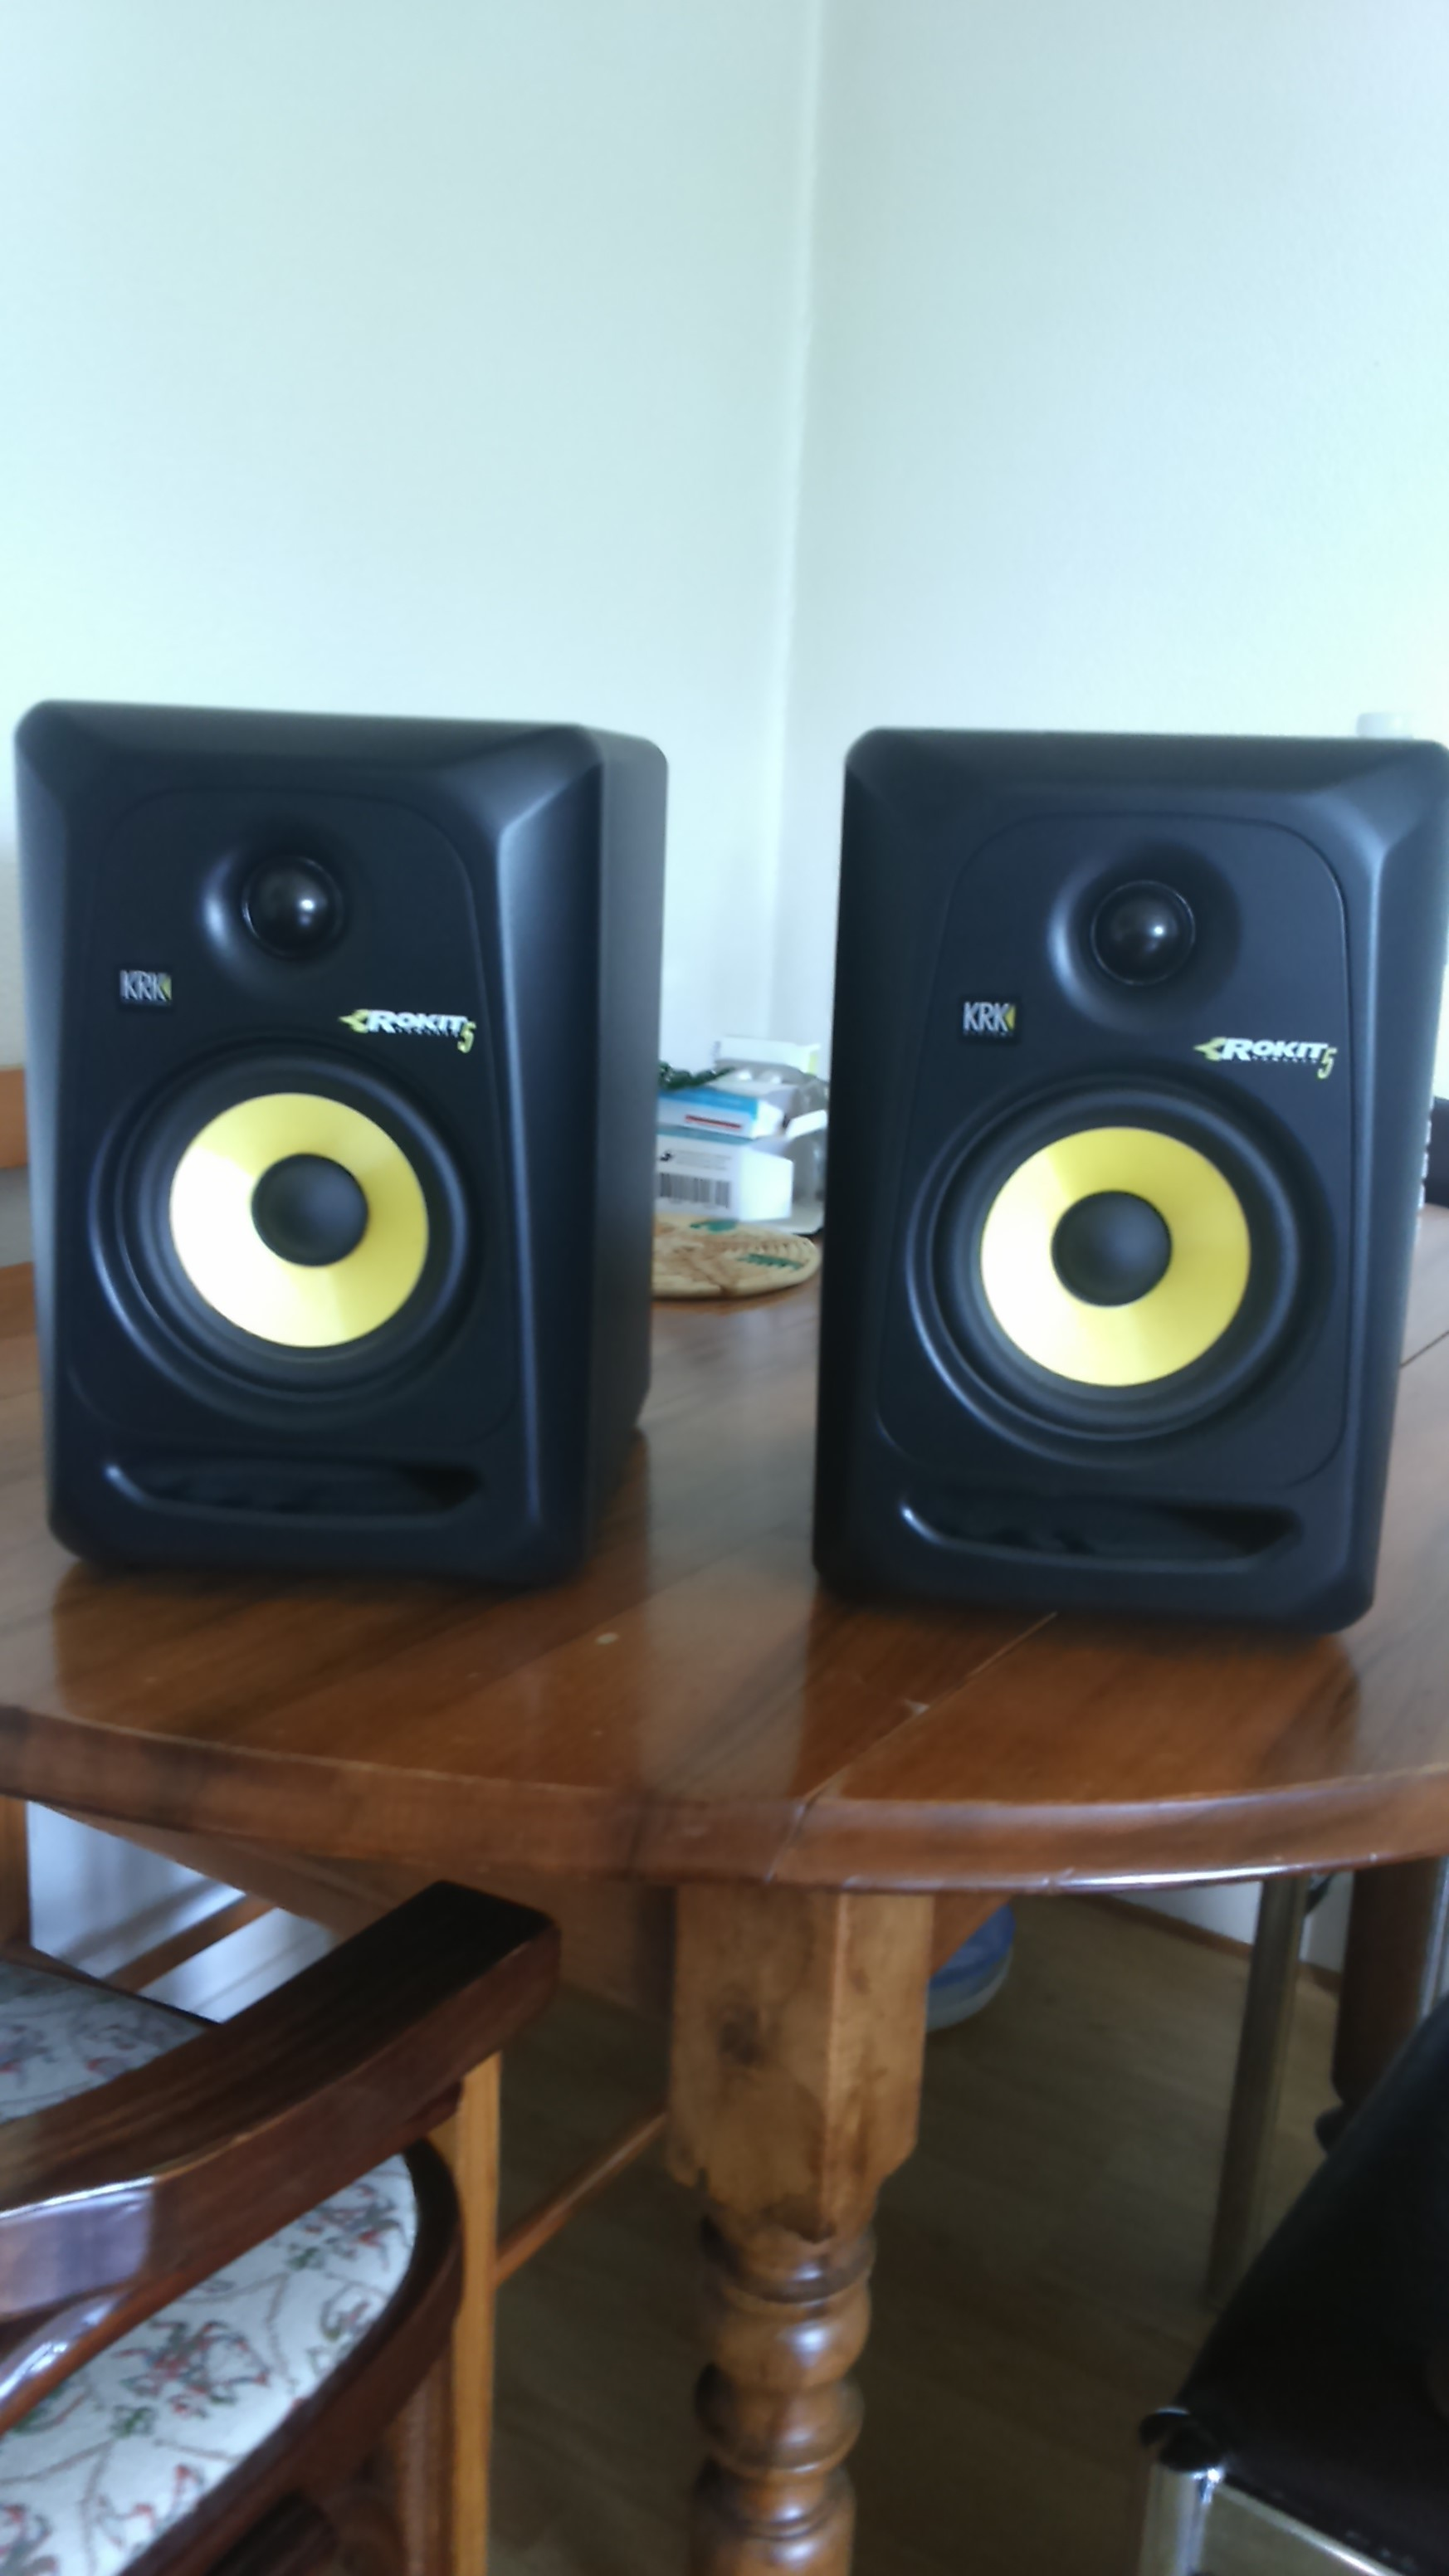 rokit 5 g3 krk rokit 5 g3 audiofanzine. Black Bedroom Furniture Sets. Home Design Ideas